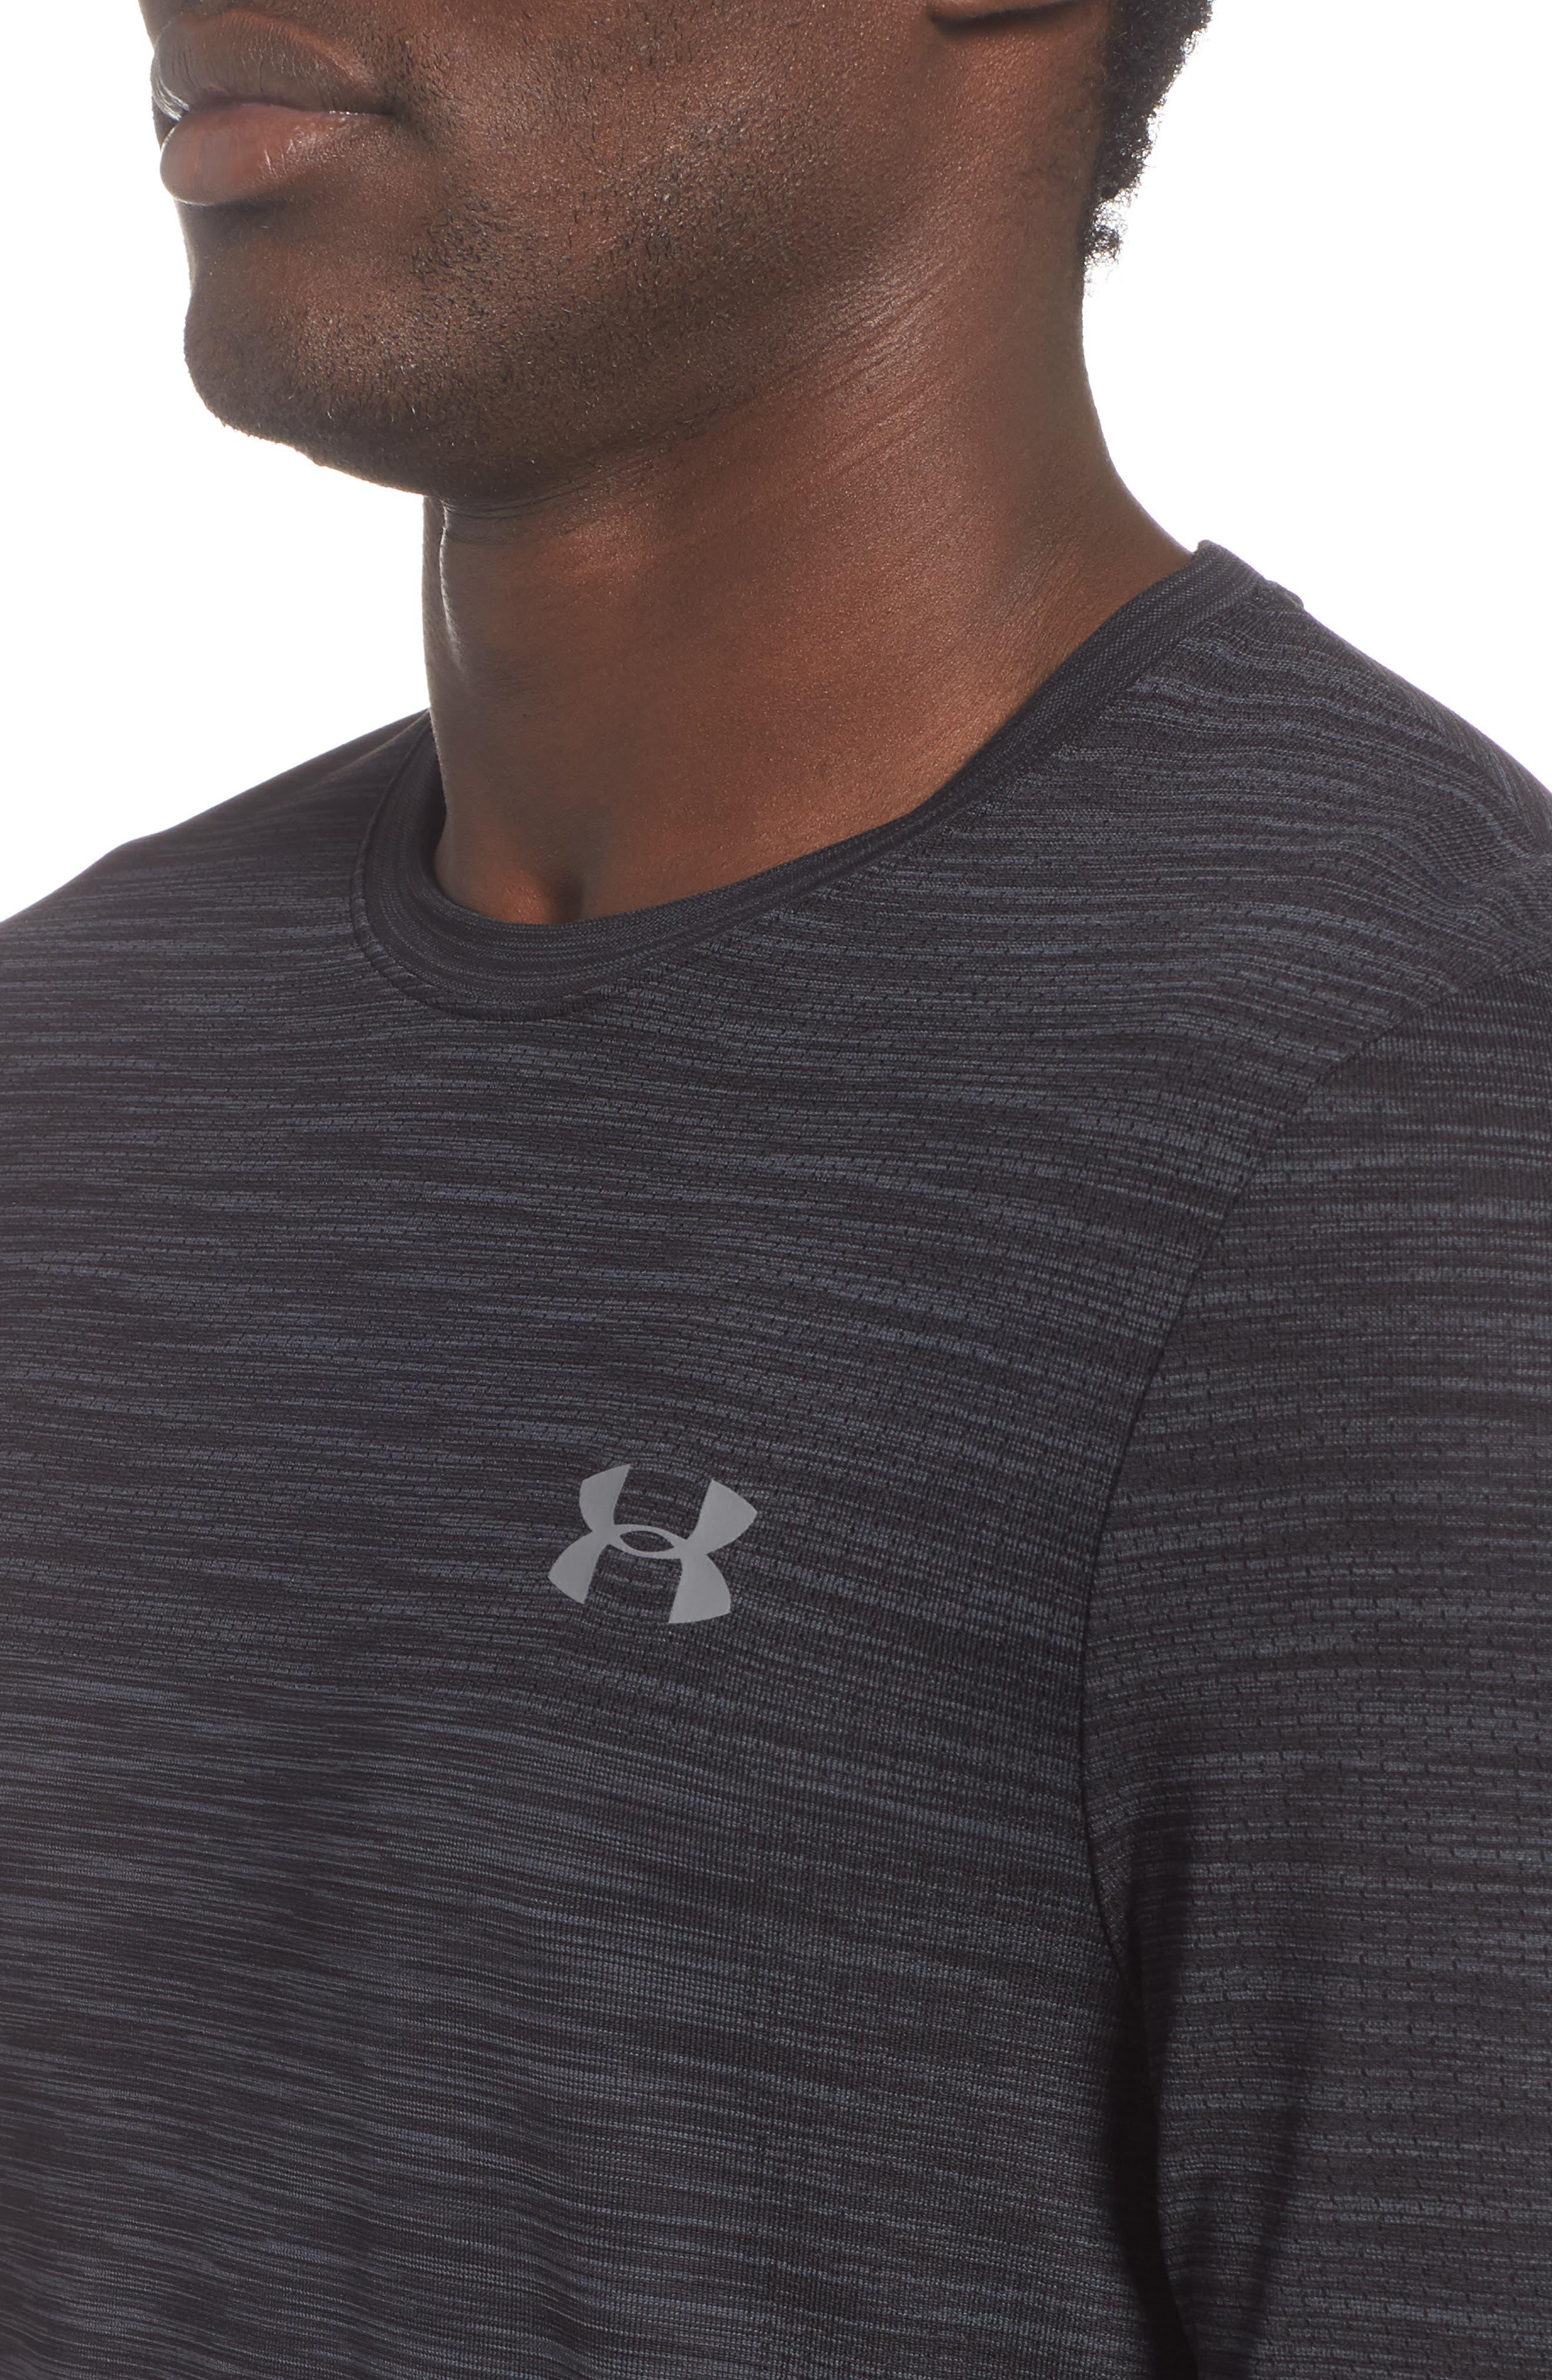 Siphon Performance T-Shirt,                             Alternate thumbnail 4, color,                             BLACK